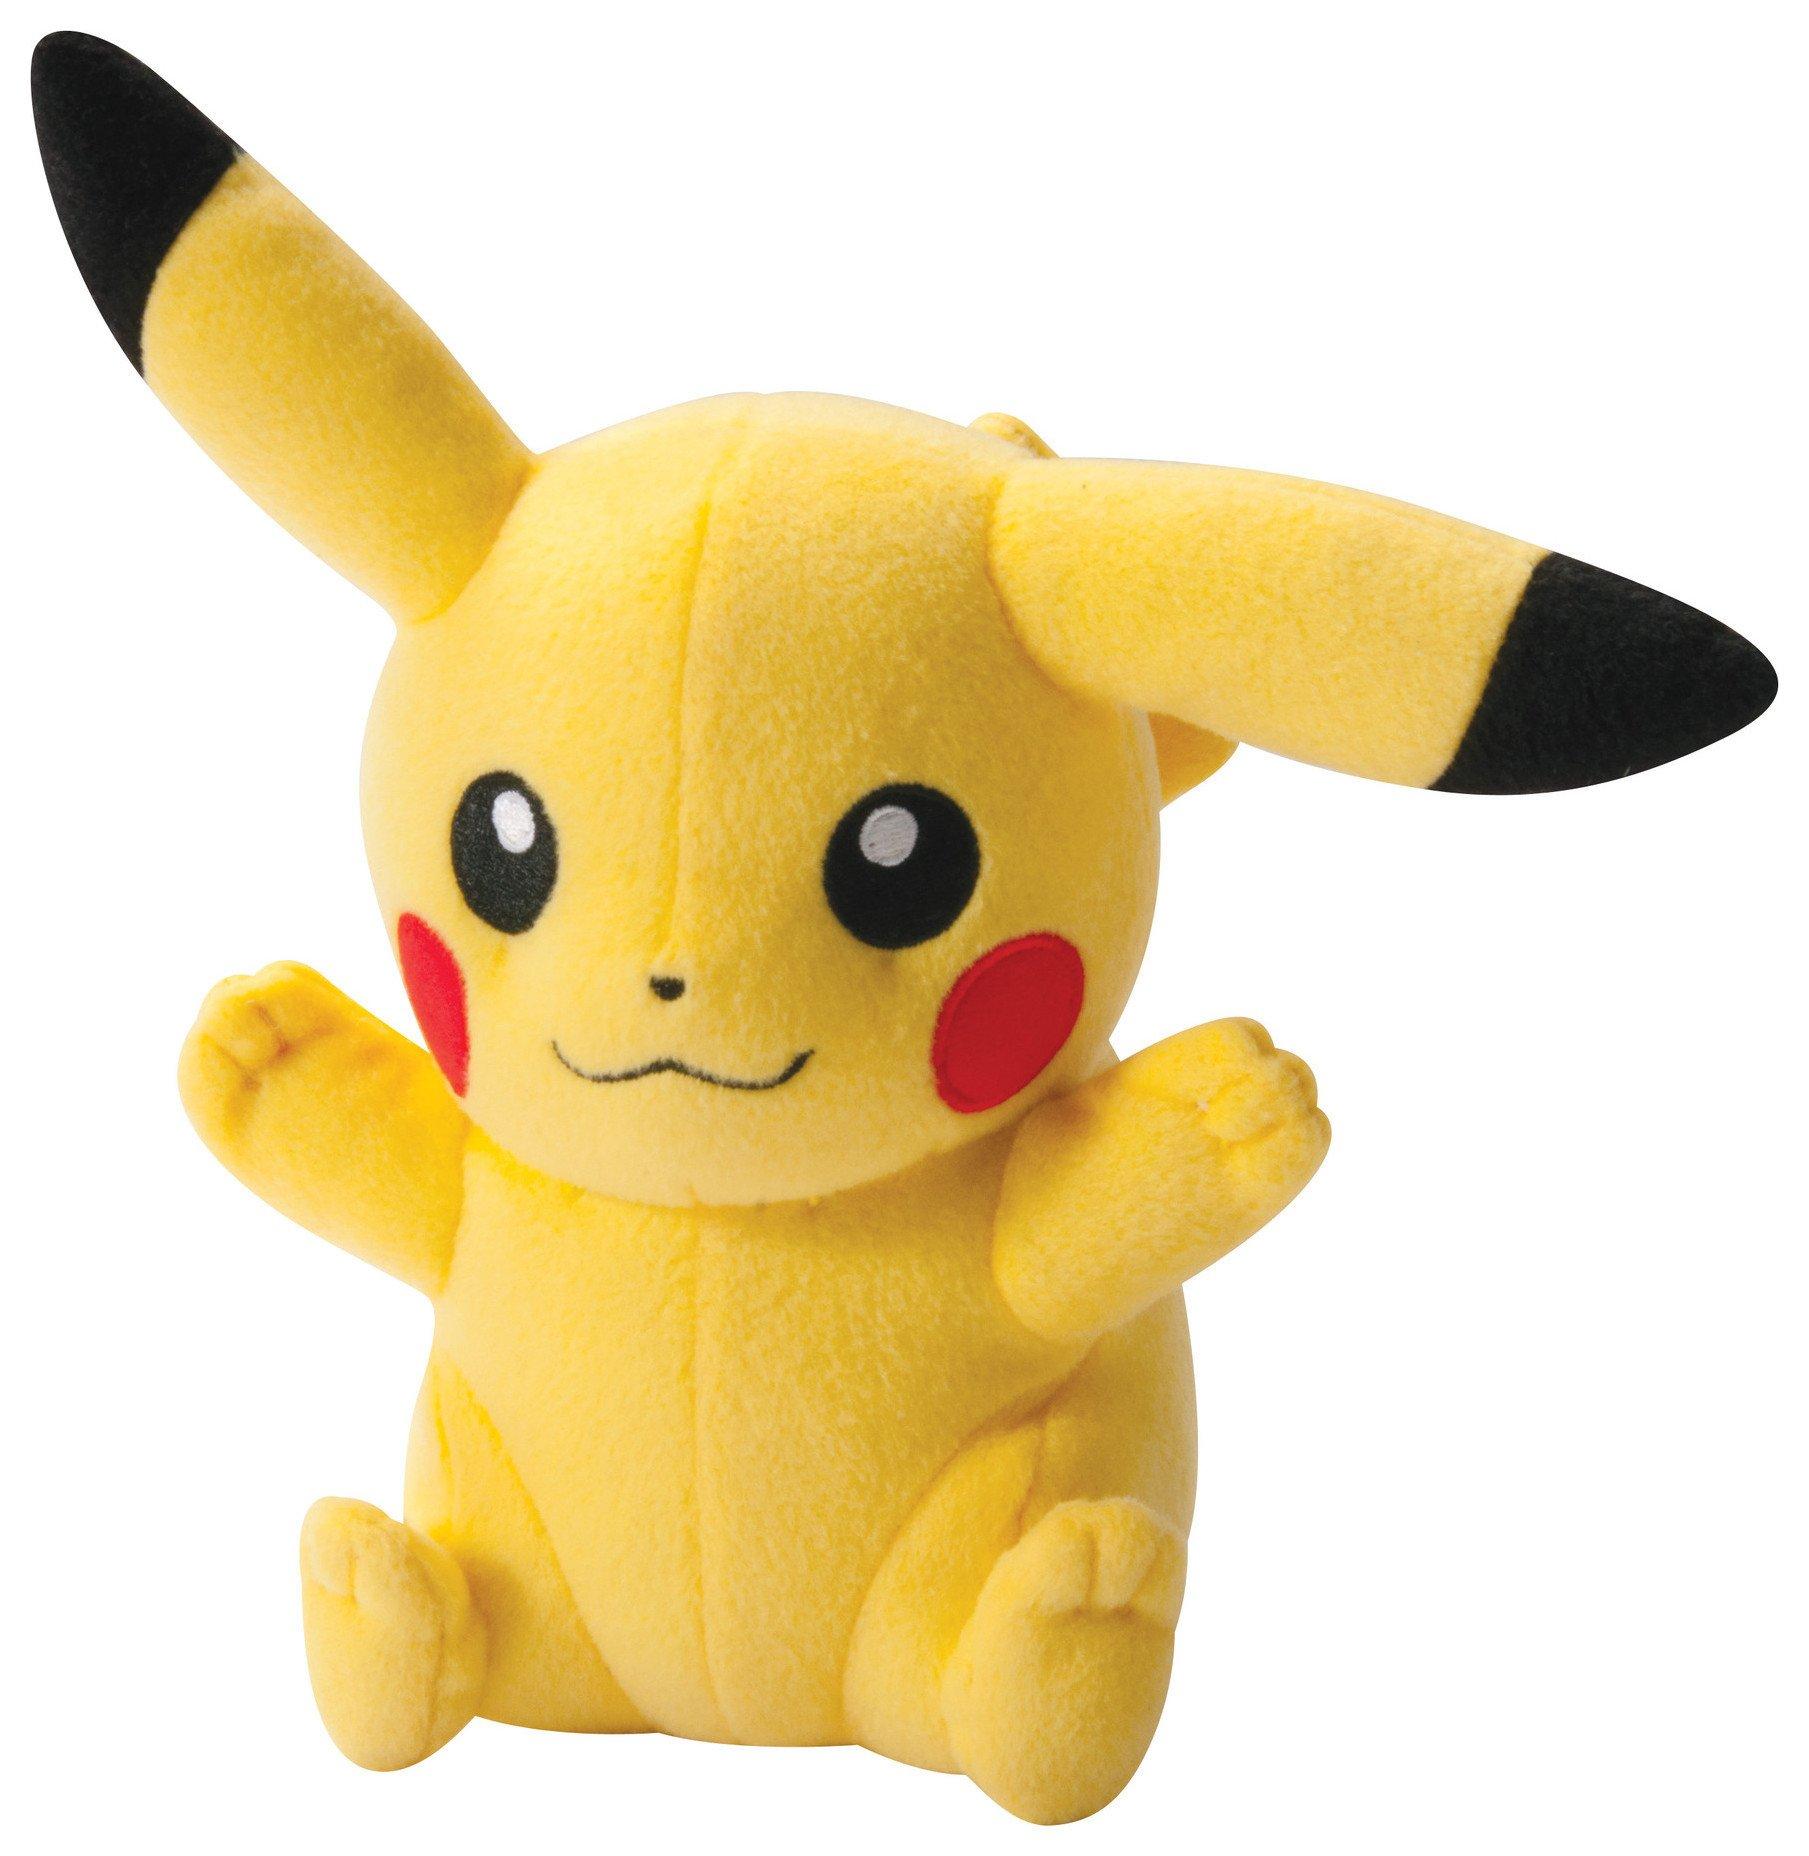 Pokemon Happy Pose Pikachu 8 Inch Plush.